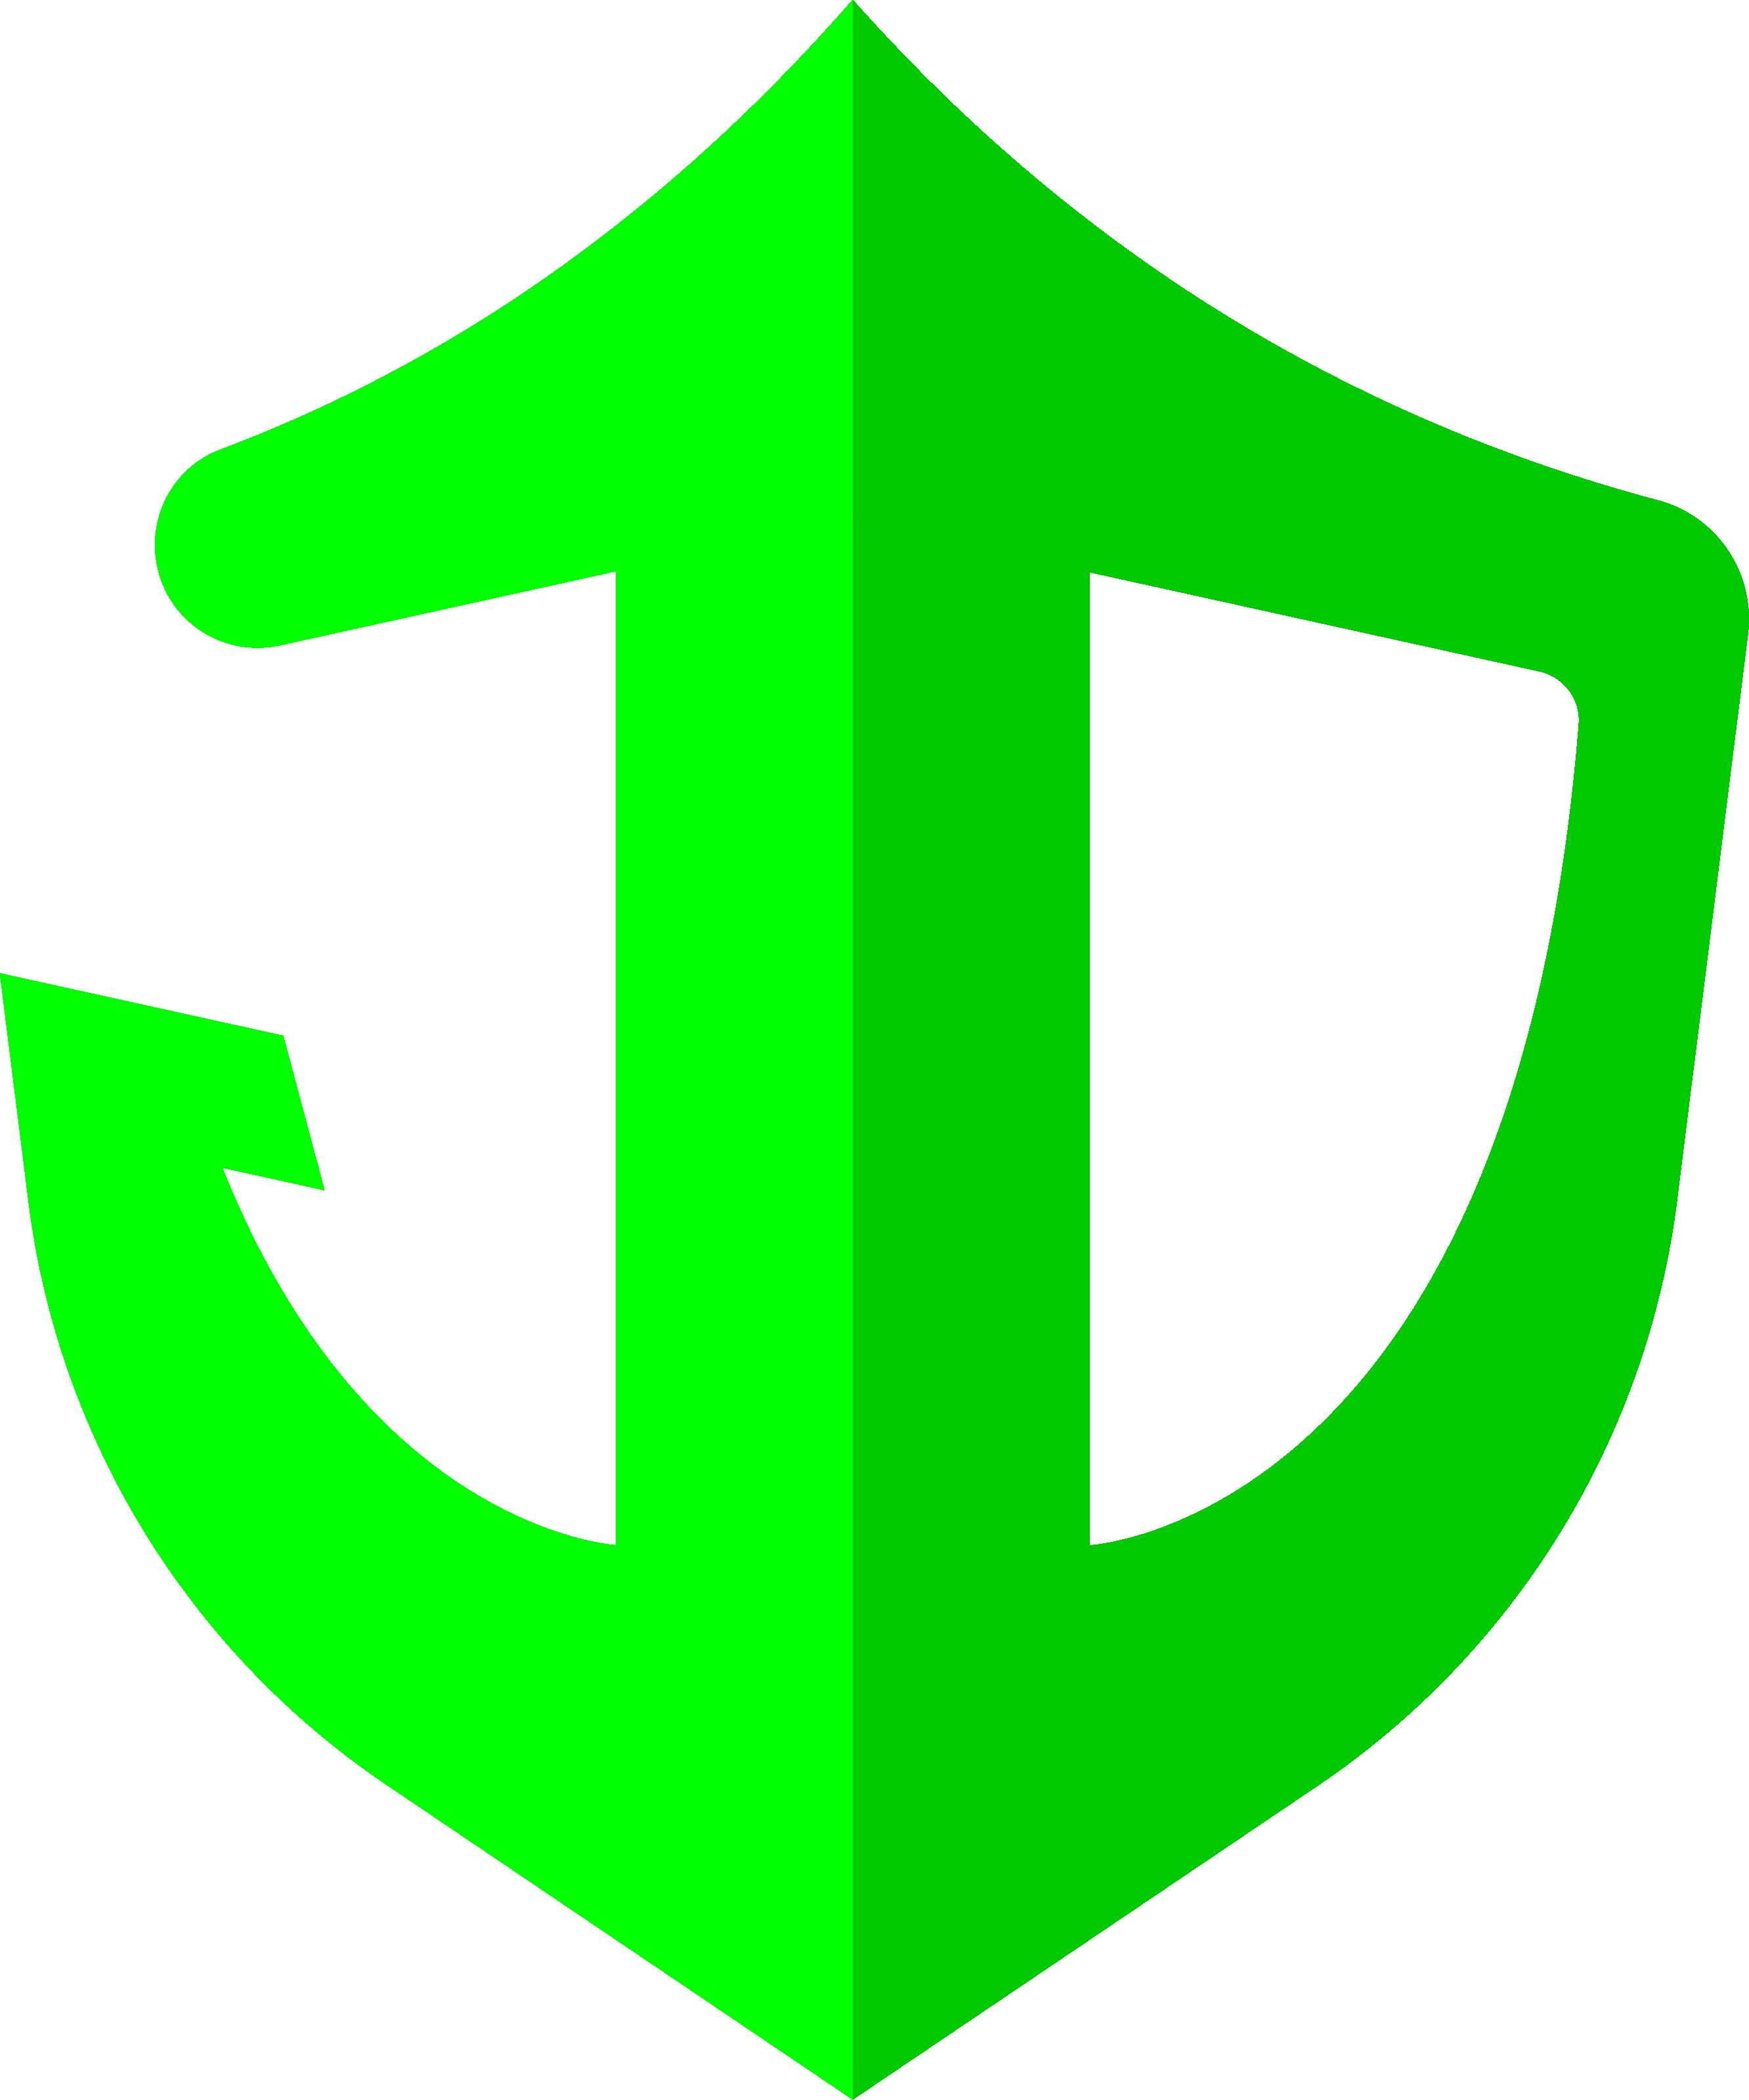 juday_design